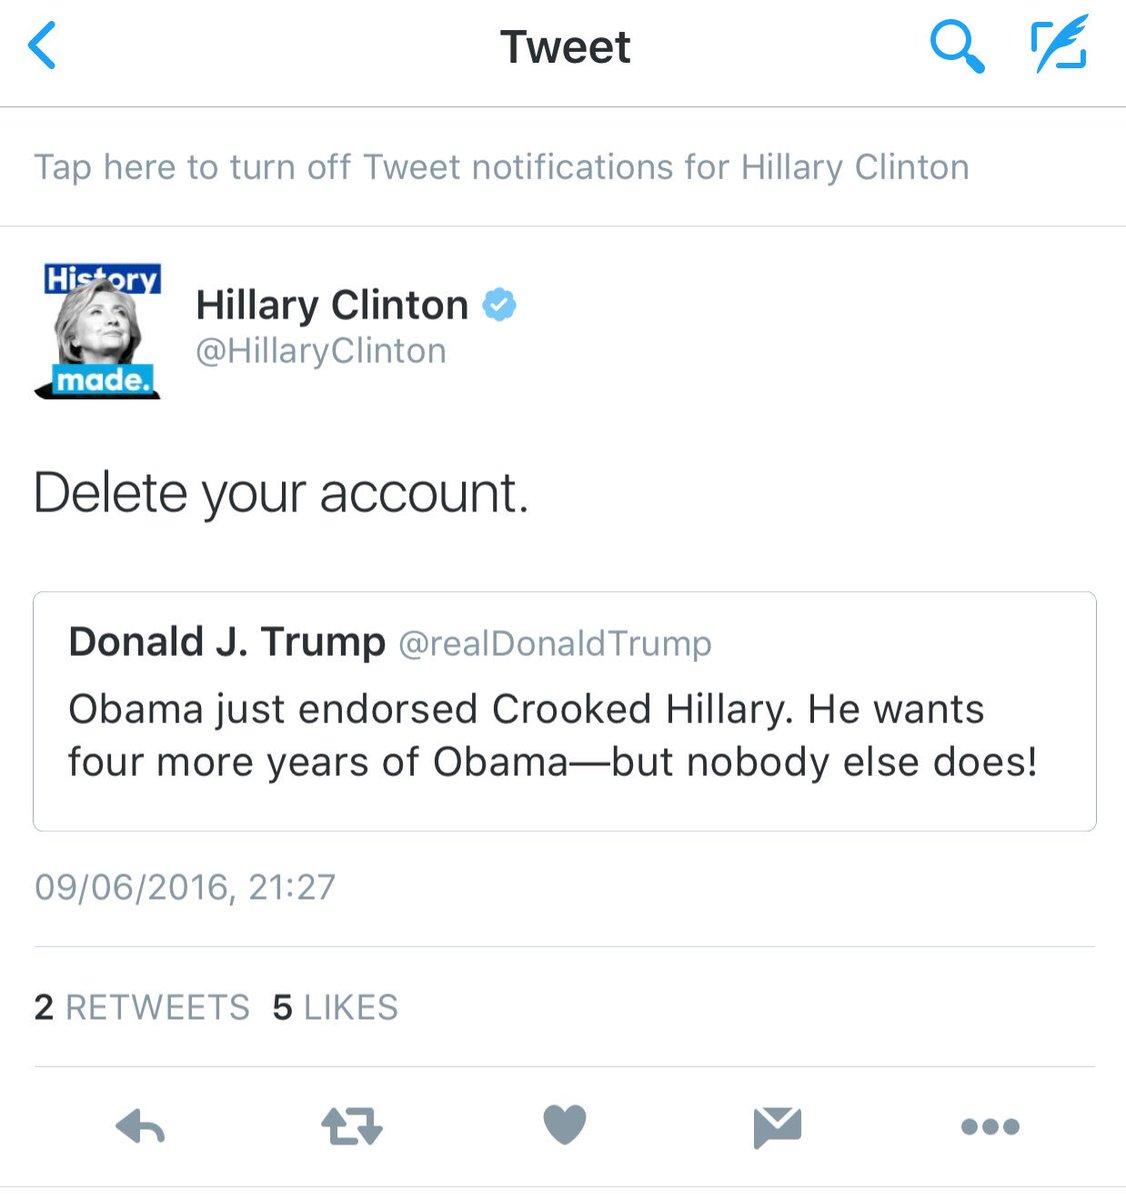 @HillaryClinton @realDonaldTrump play nice children.